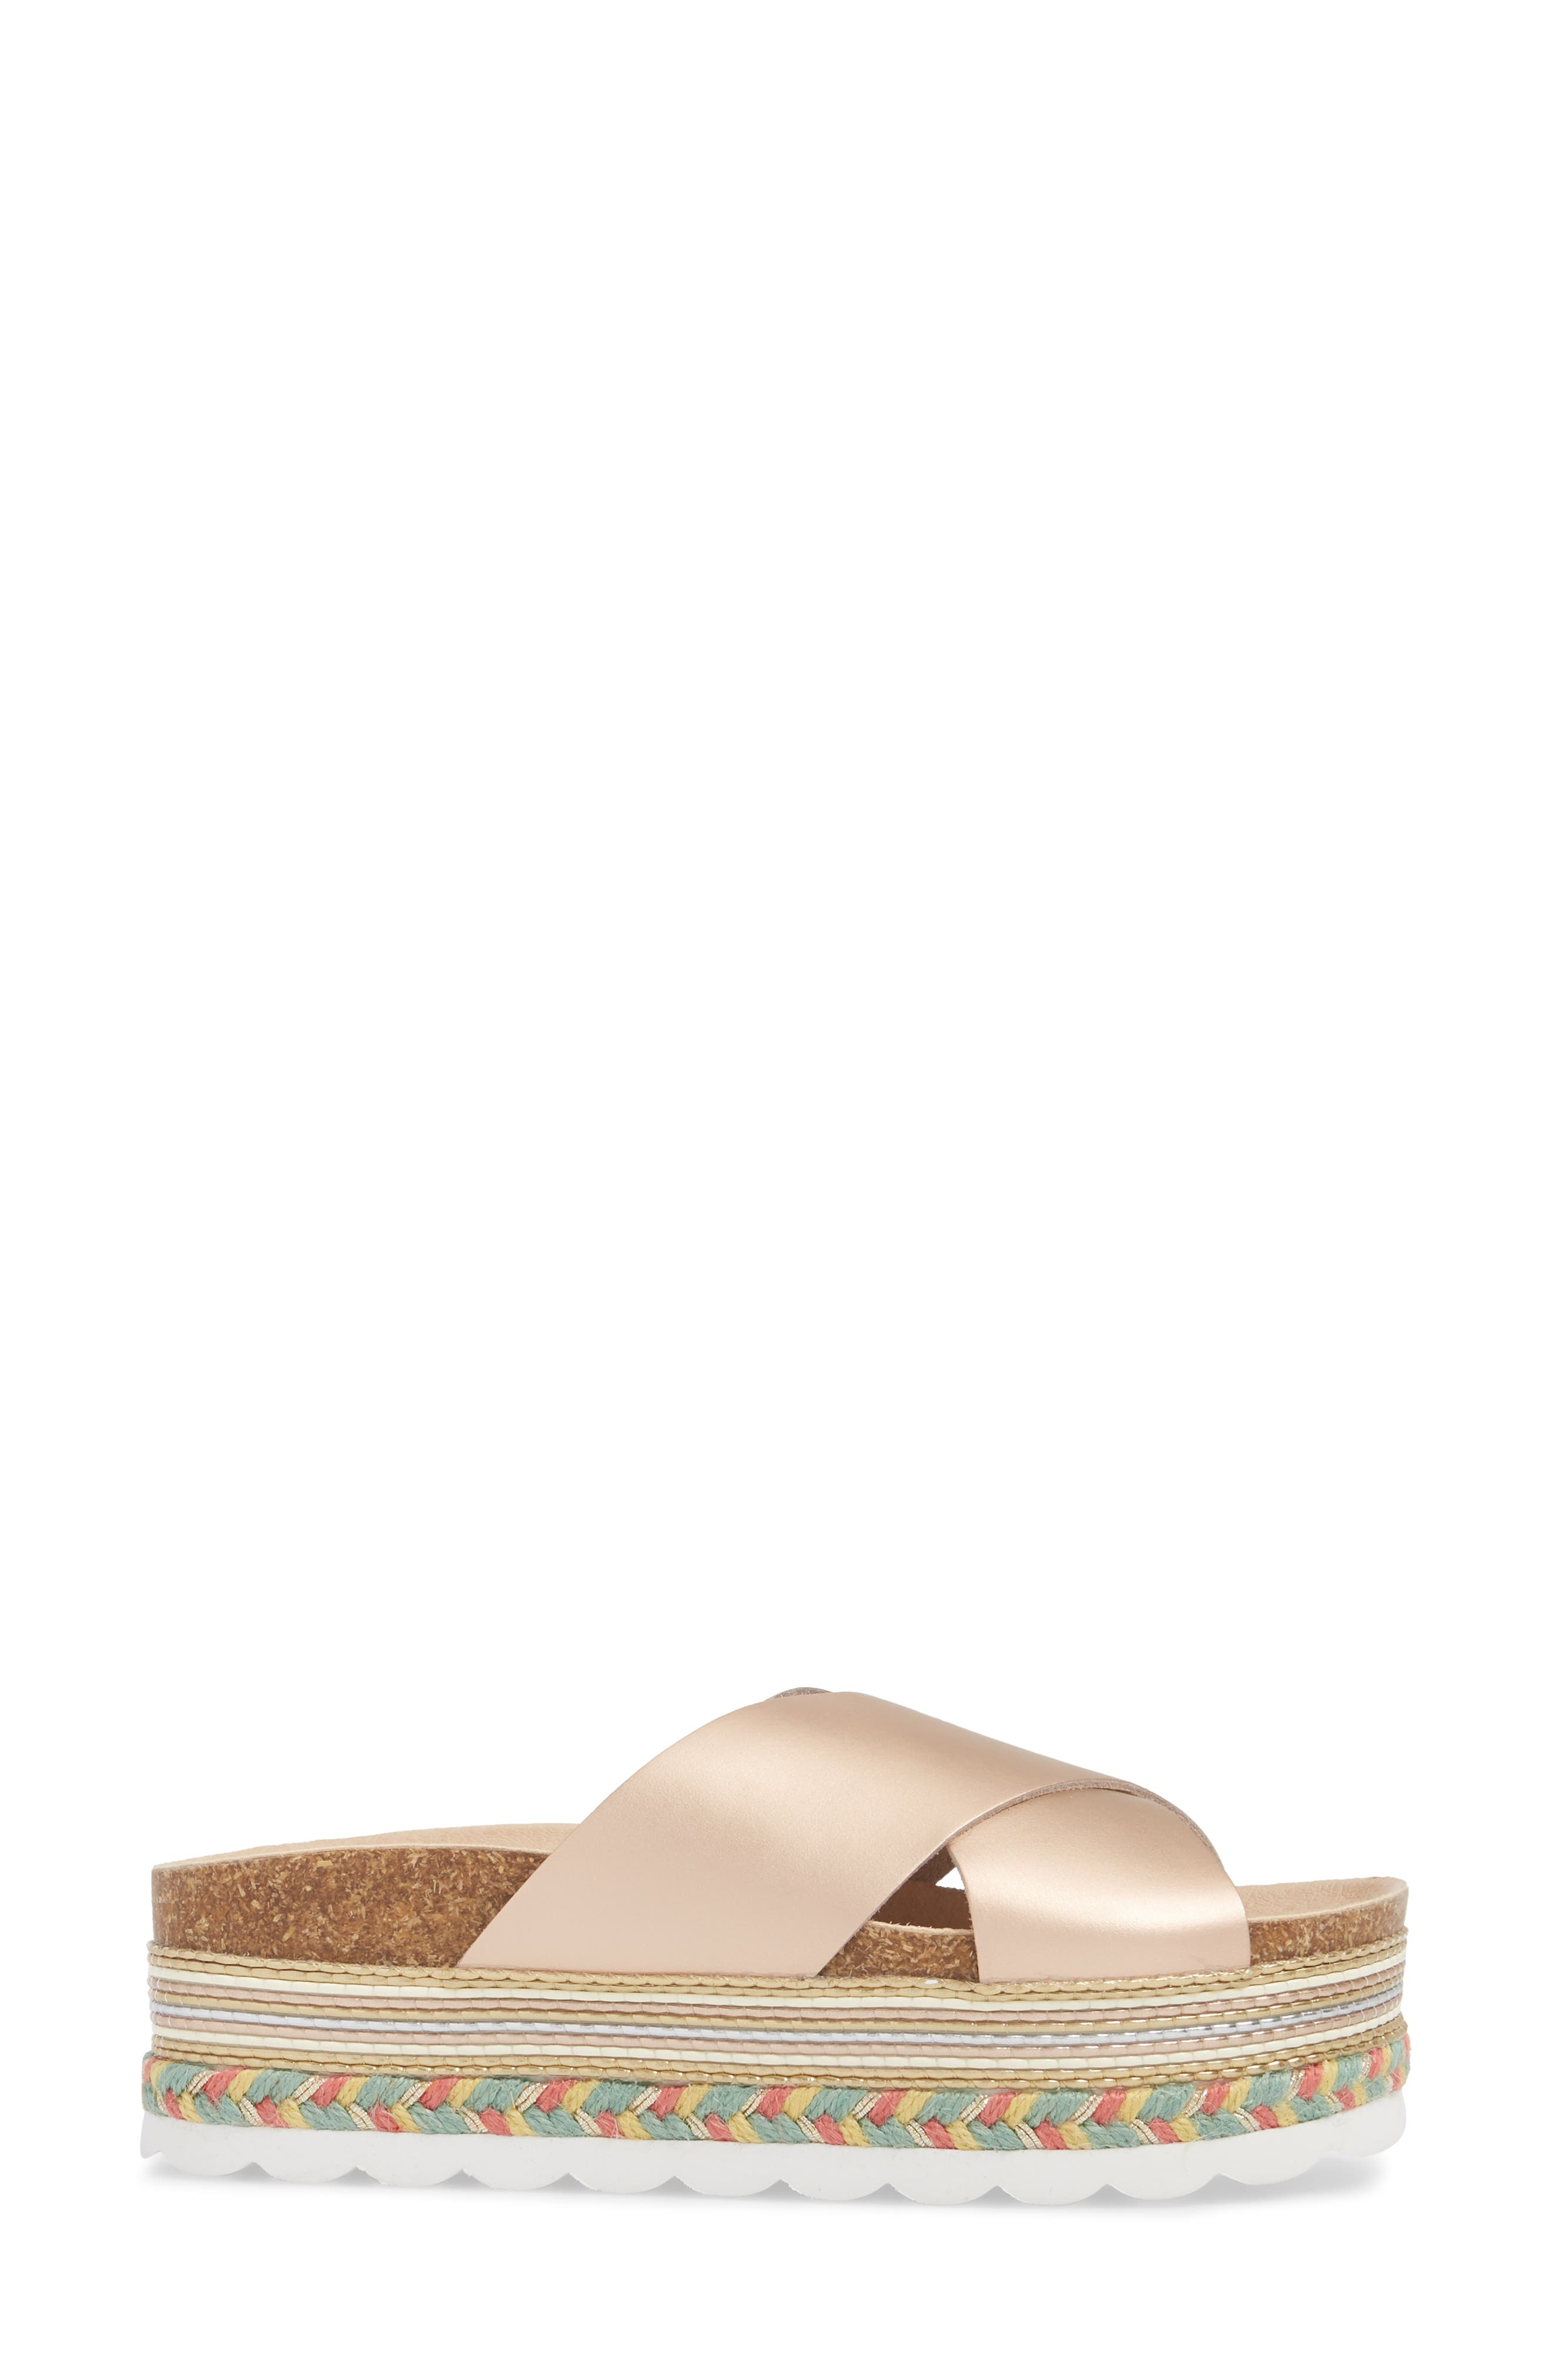 Torri Platform Slide Sandal,                             Alternate thumbnail 3, color,                             Rose Gold Leather